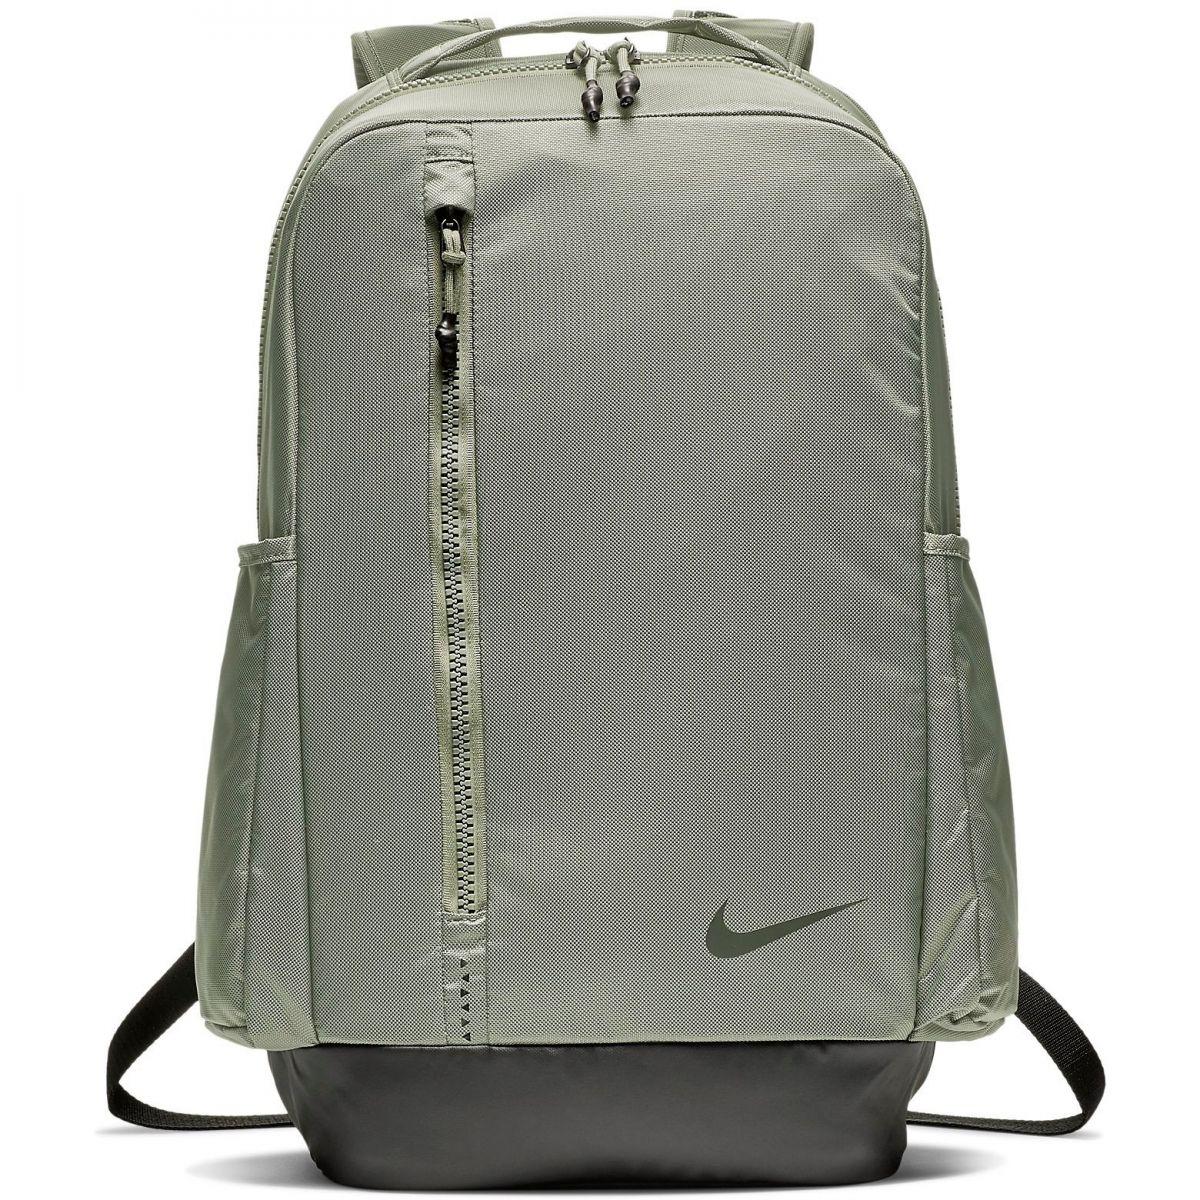 274d1aad30 Type Backpacks Nike Vapor Power 2.0 Training Backpack